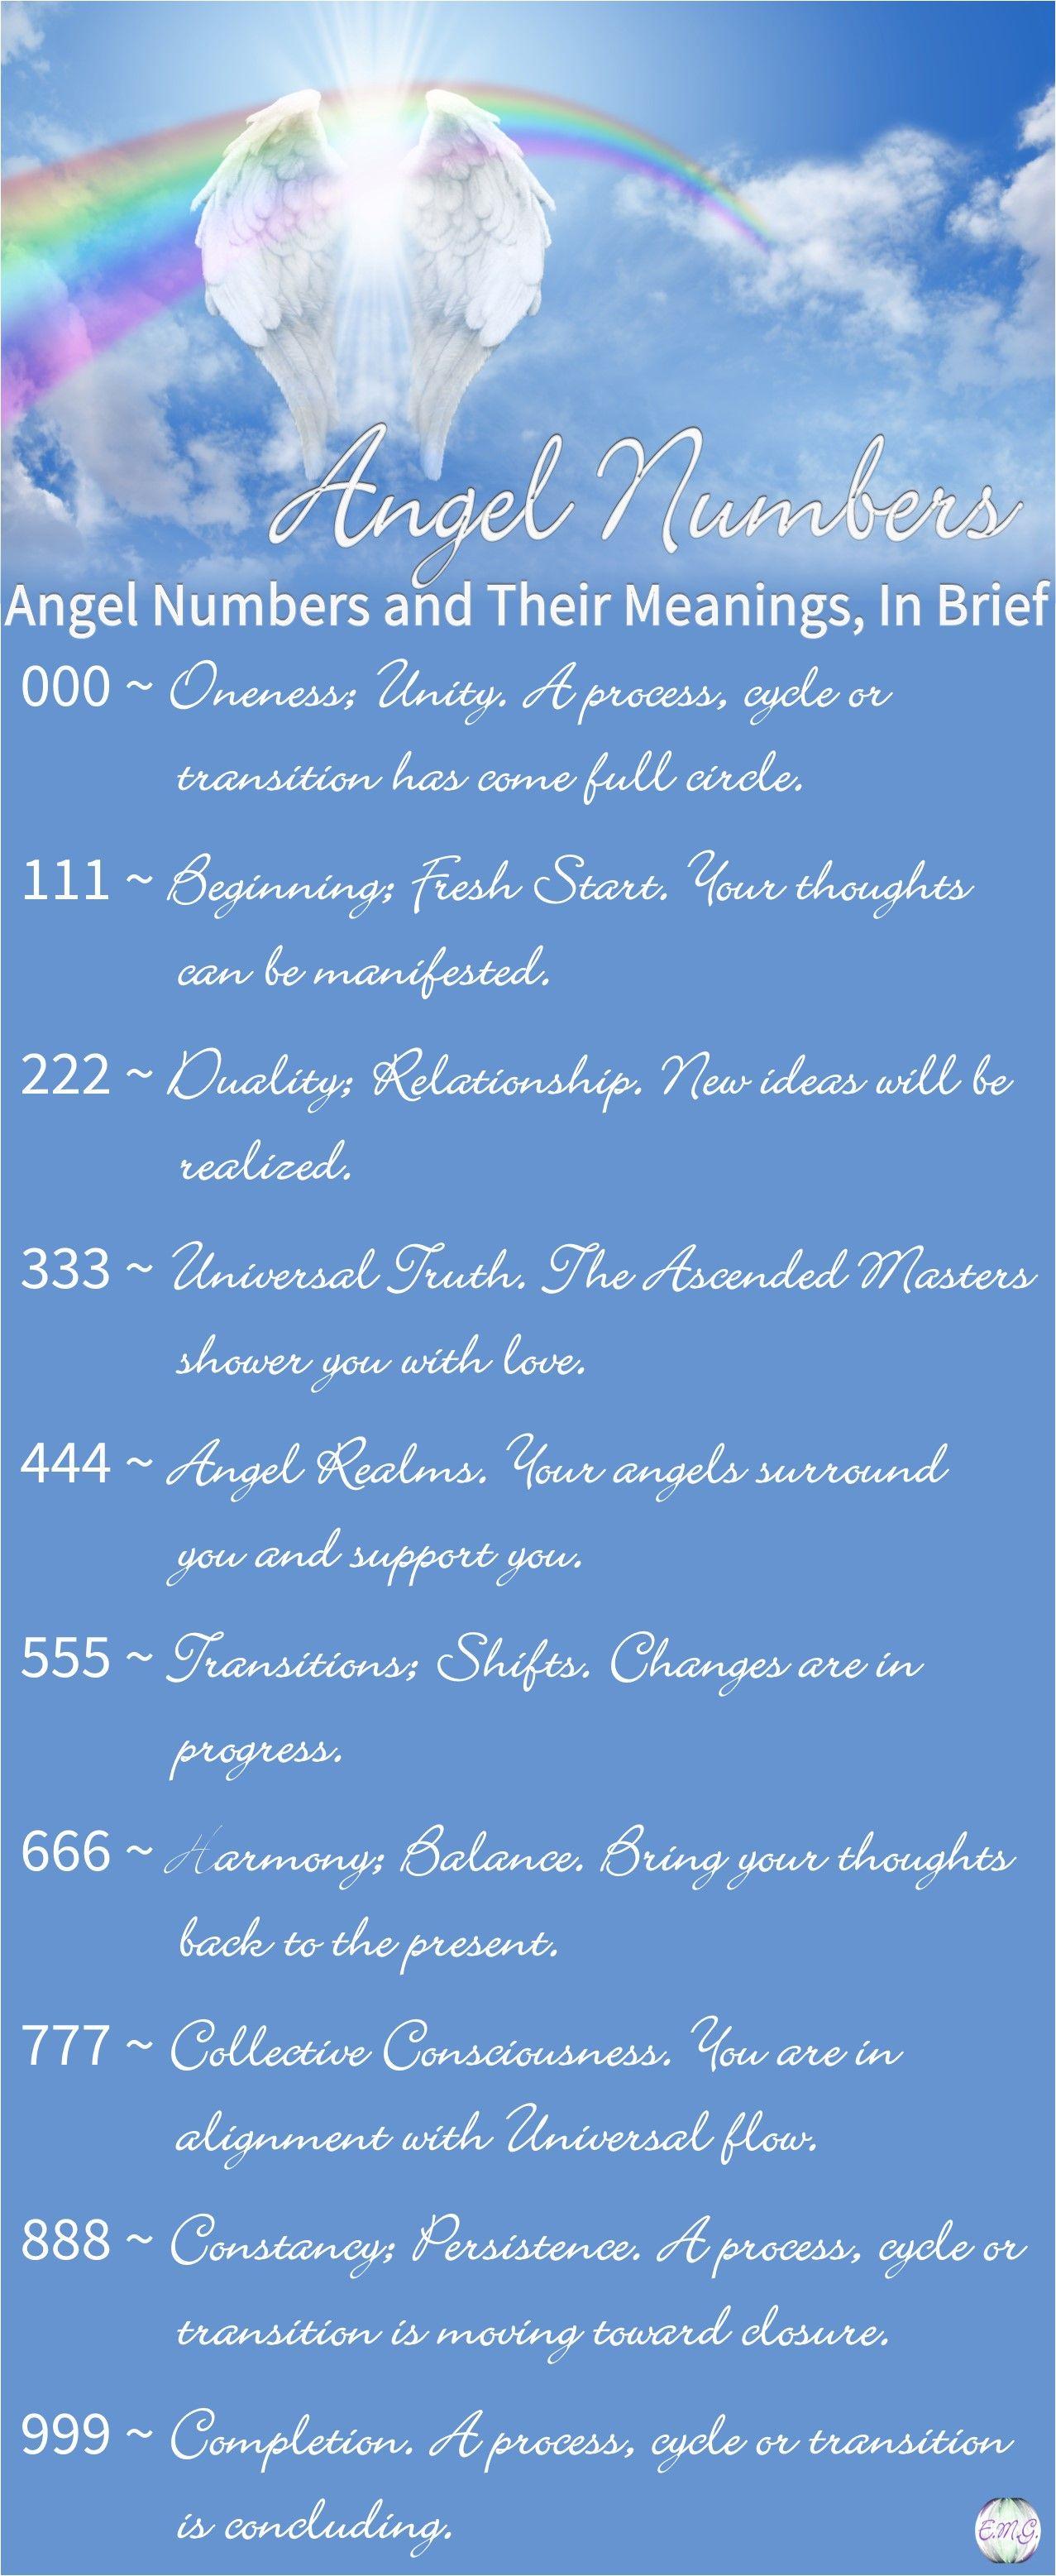 Angel Numbers Meanings (In Brief